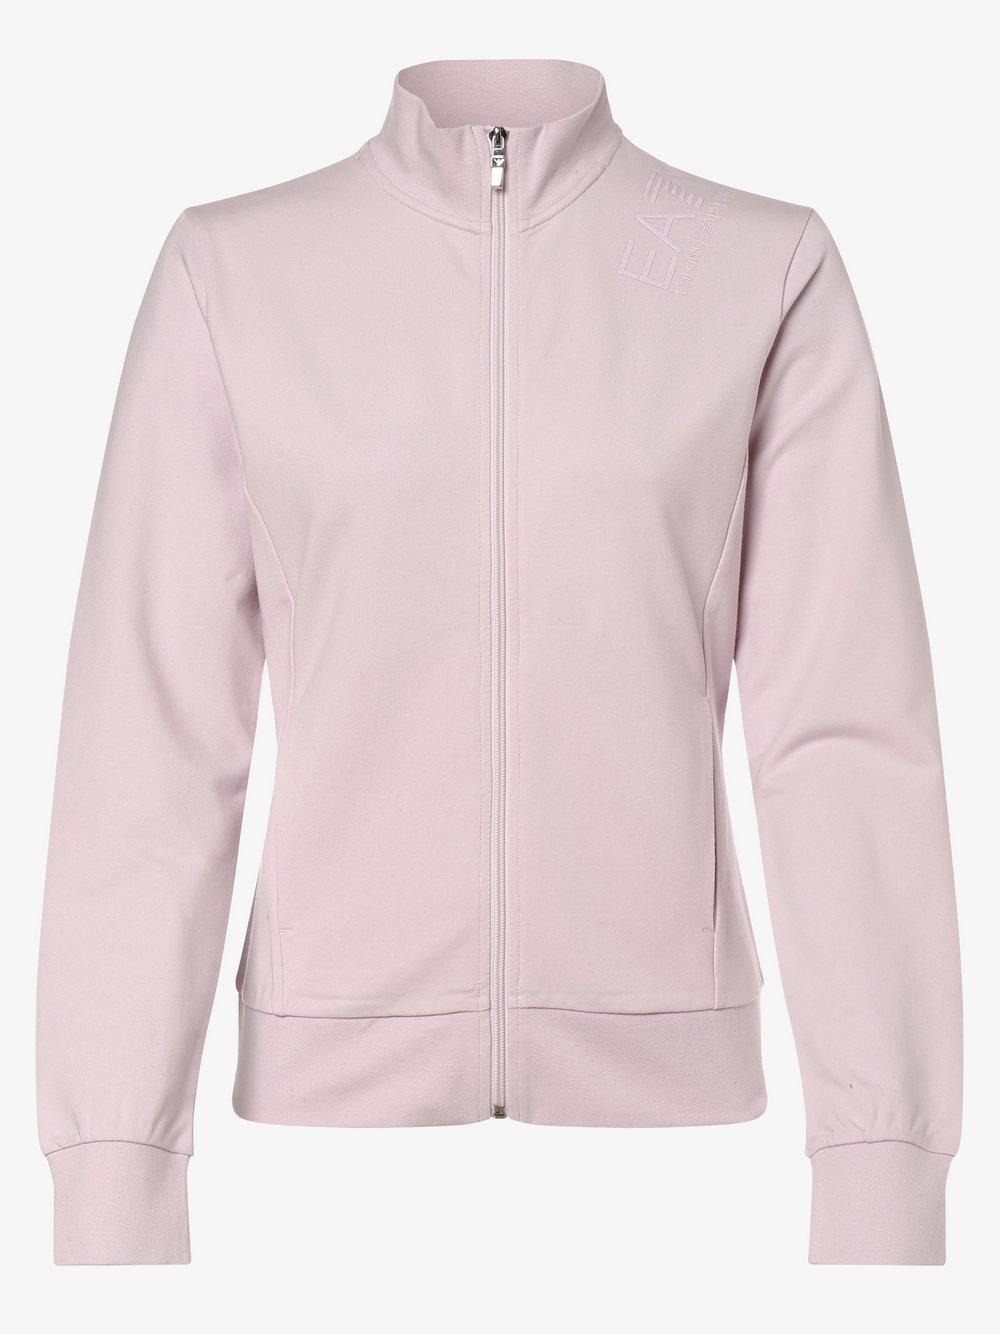 EA7 Emporio Armani - Damska bluza rozpinana, lila